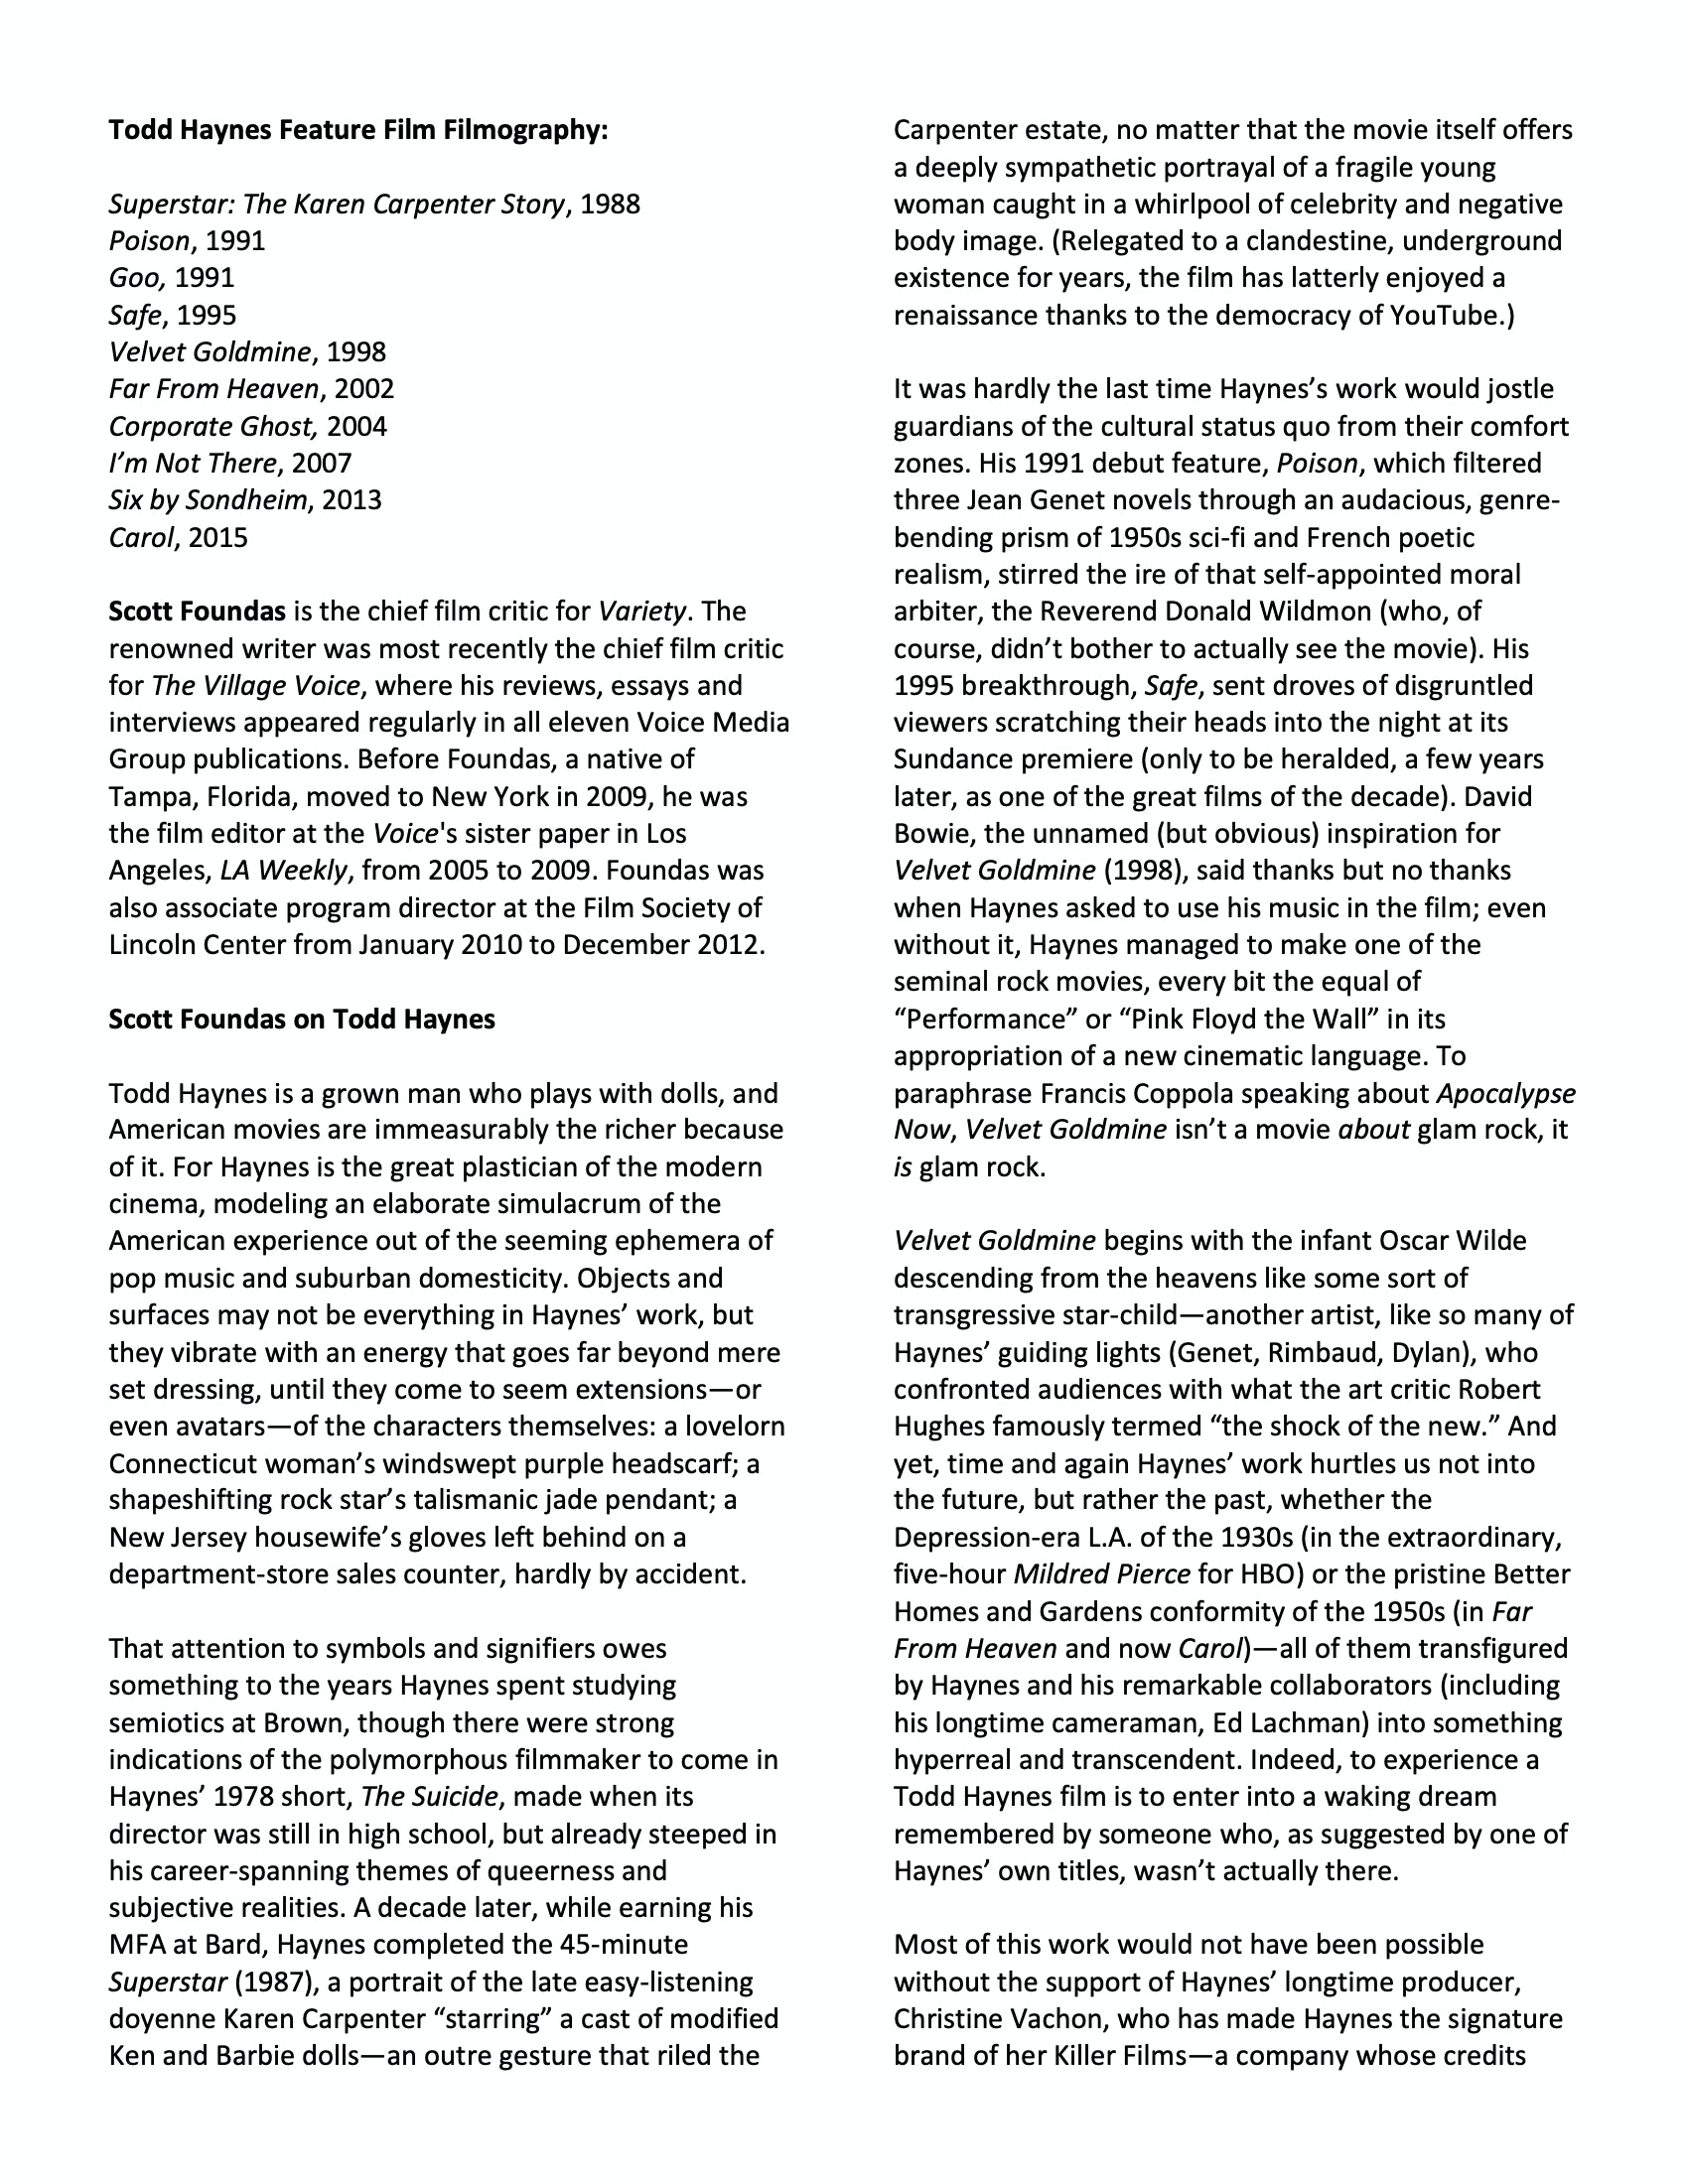 Todd Haynes Dialogues event program notes pg 4